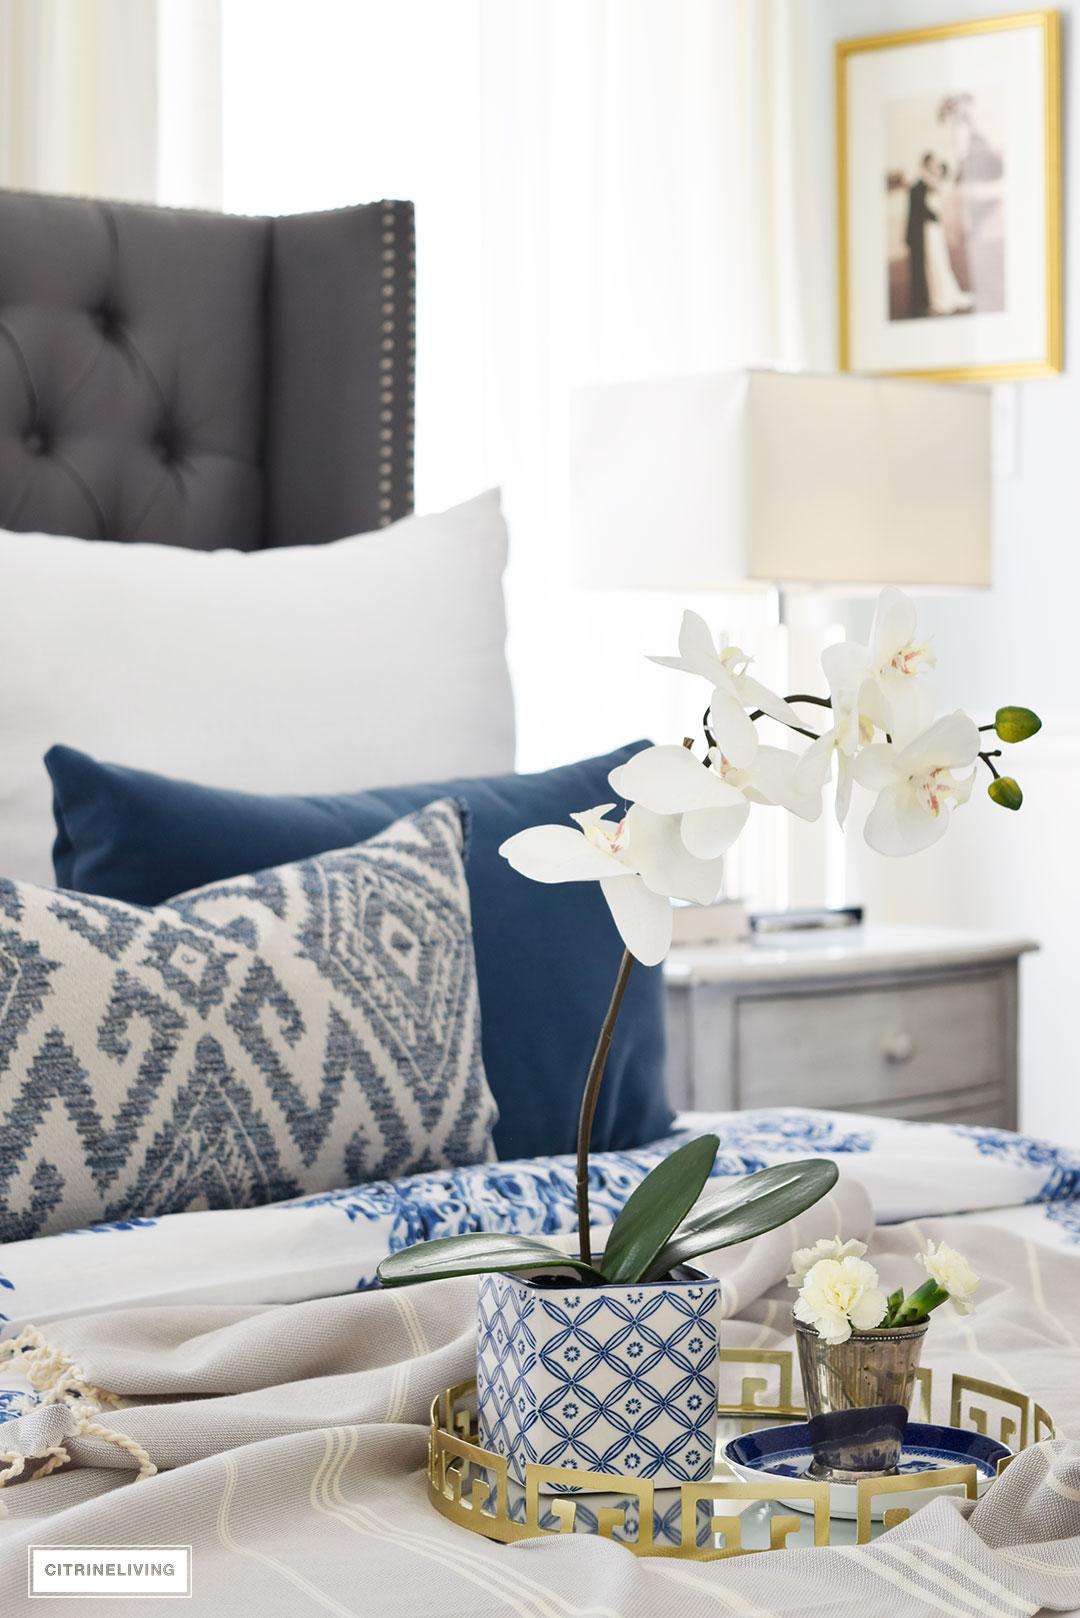 citrineliving spring in full swing home tour 2017. Black Bedroom Furniture Sets. Home Design Ideas